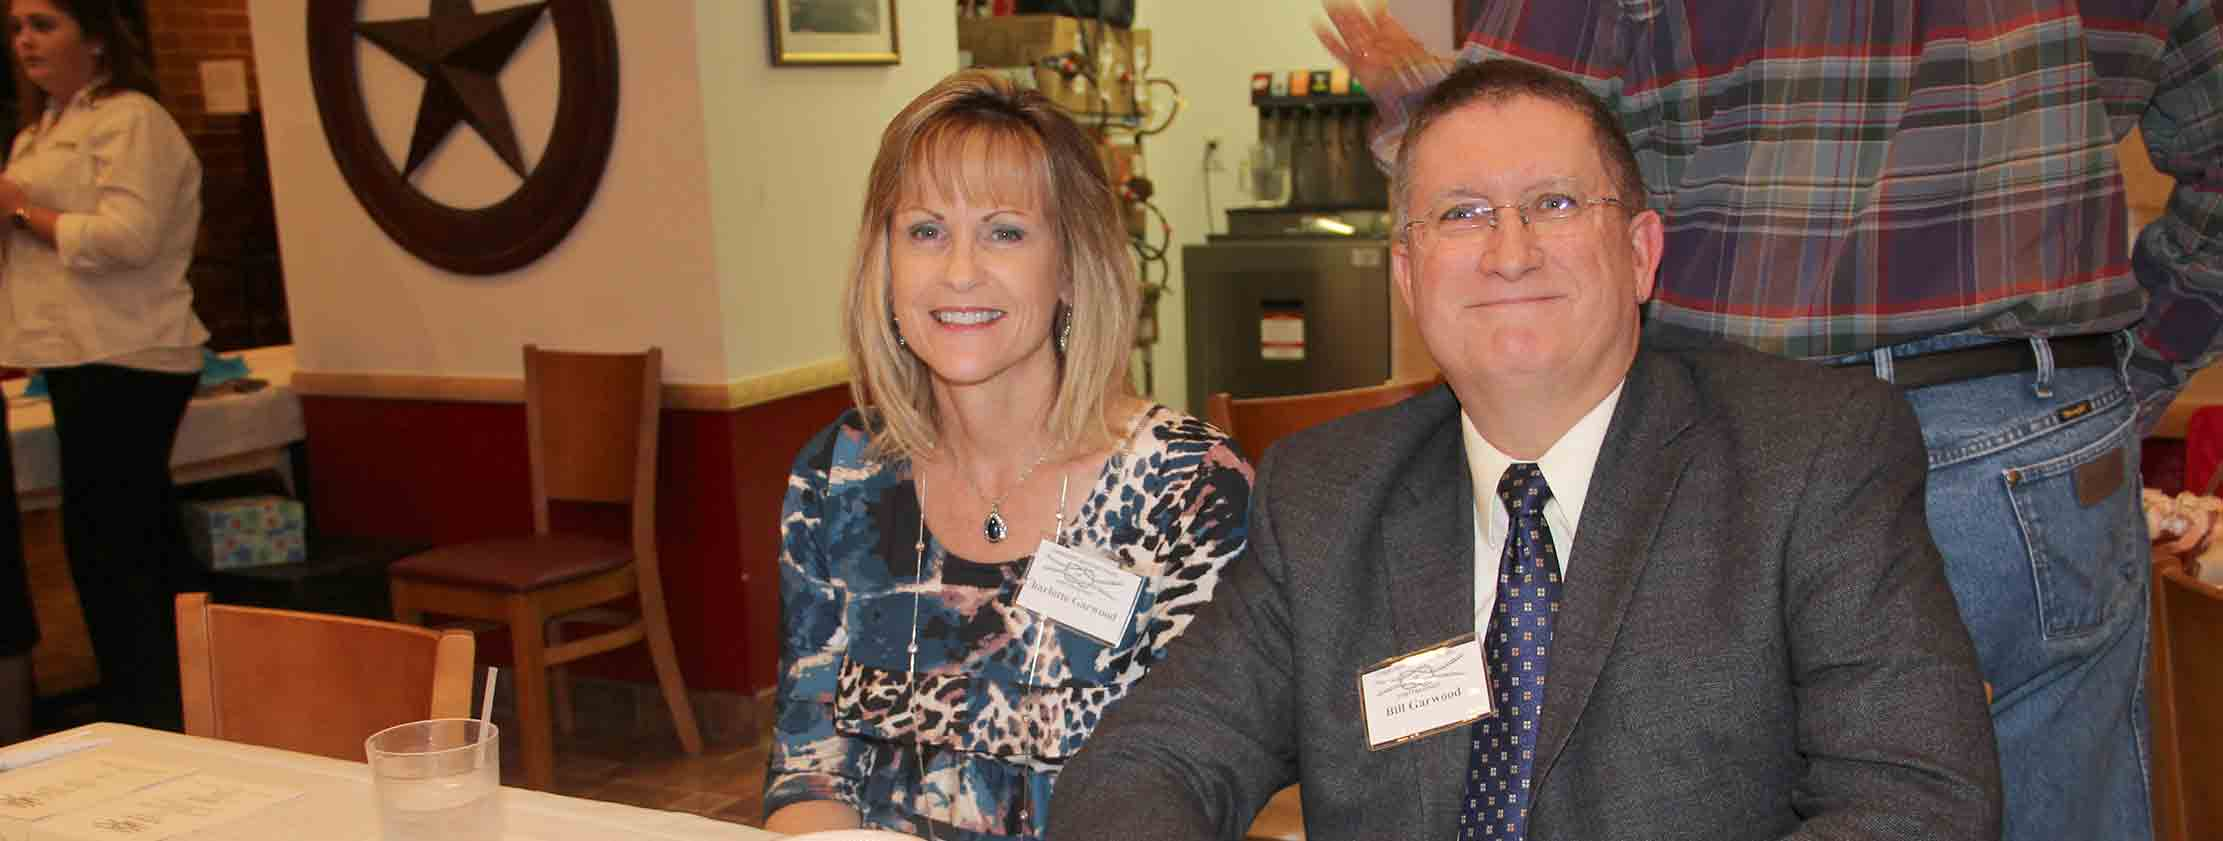 port freeport texas community advisory panel